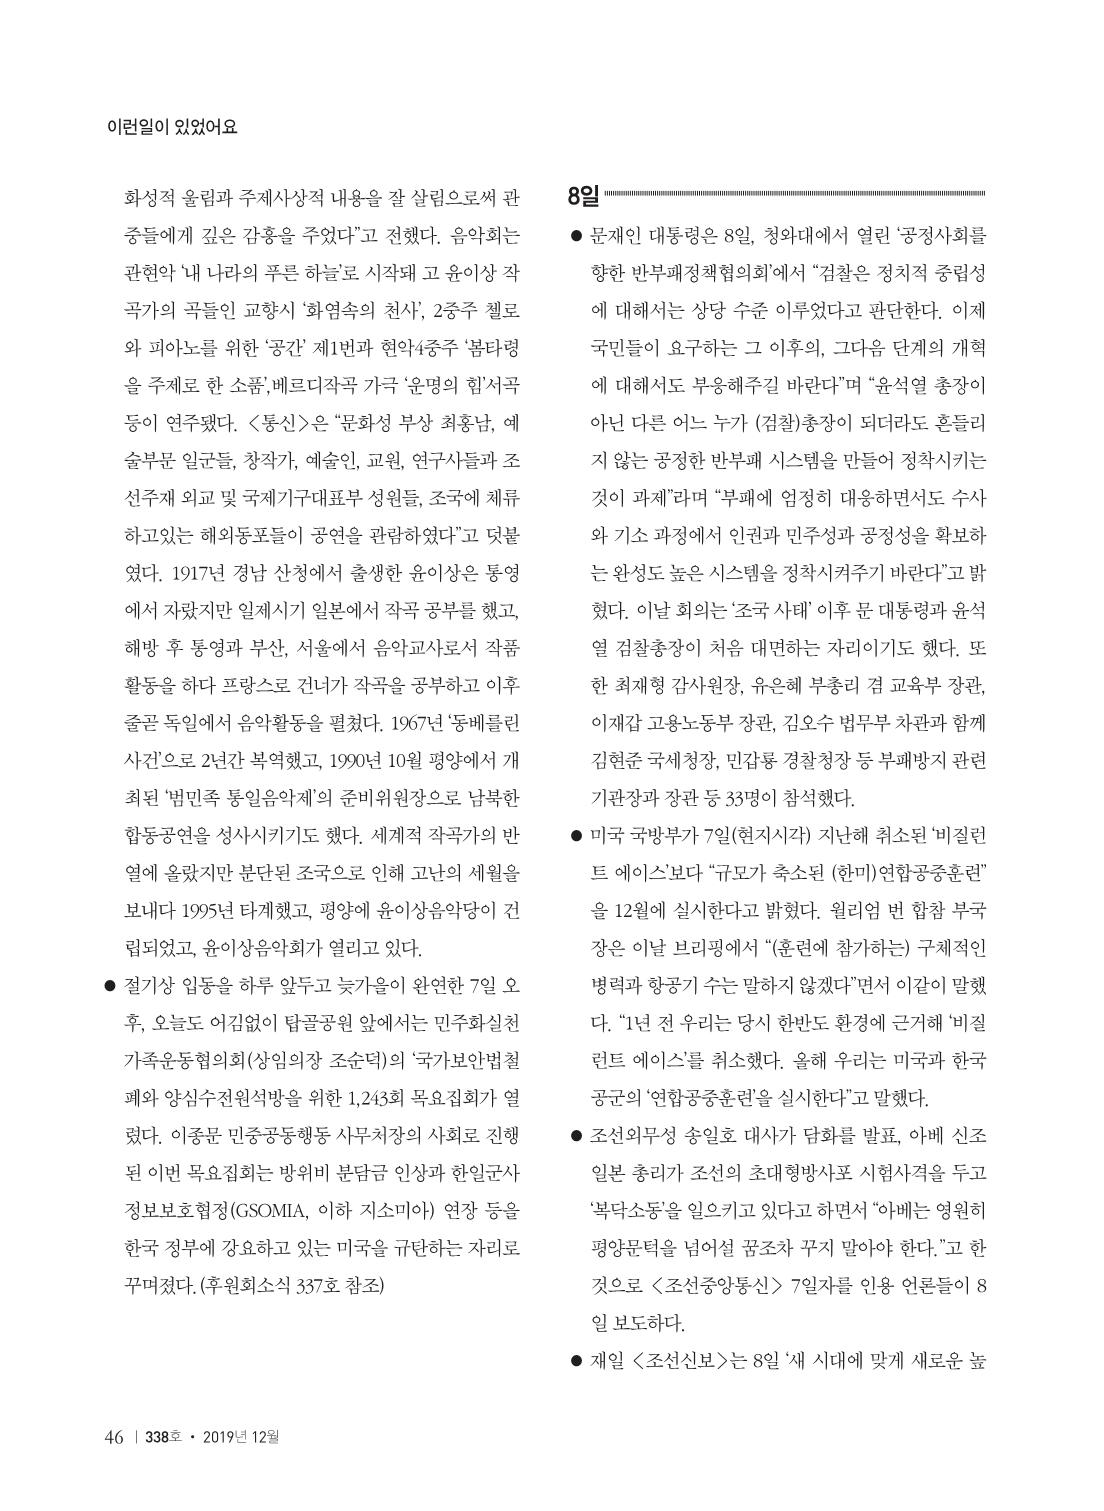 5802db1f-6a90-451c-ac2e-da2a23bee939.pdf-0048.jpg